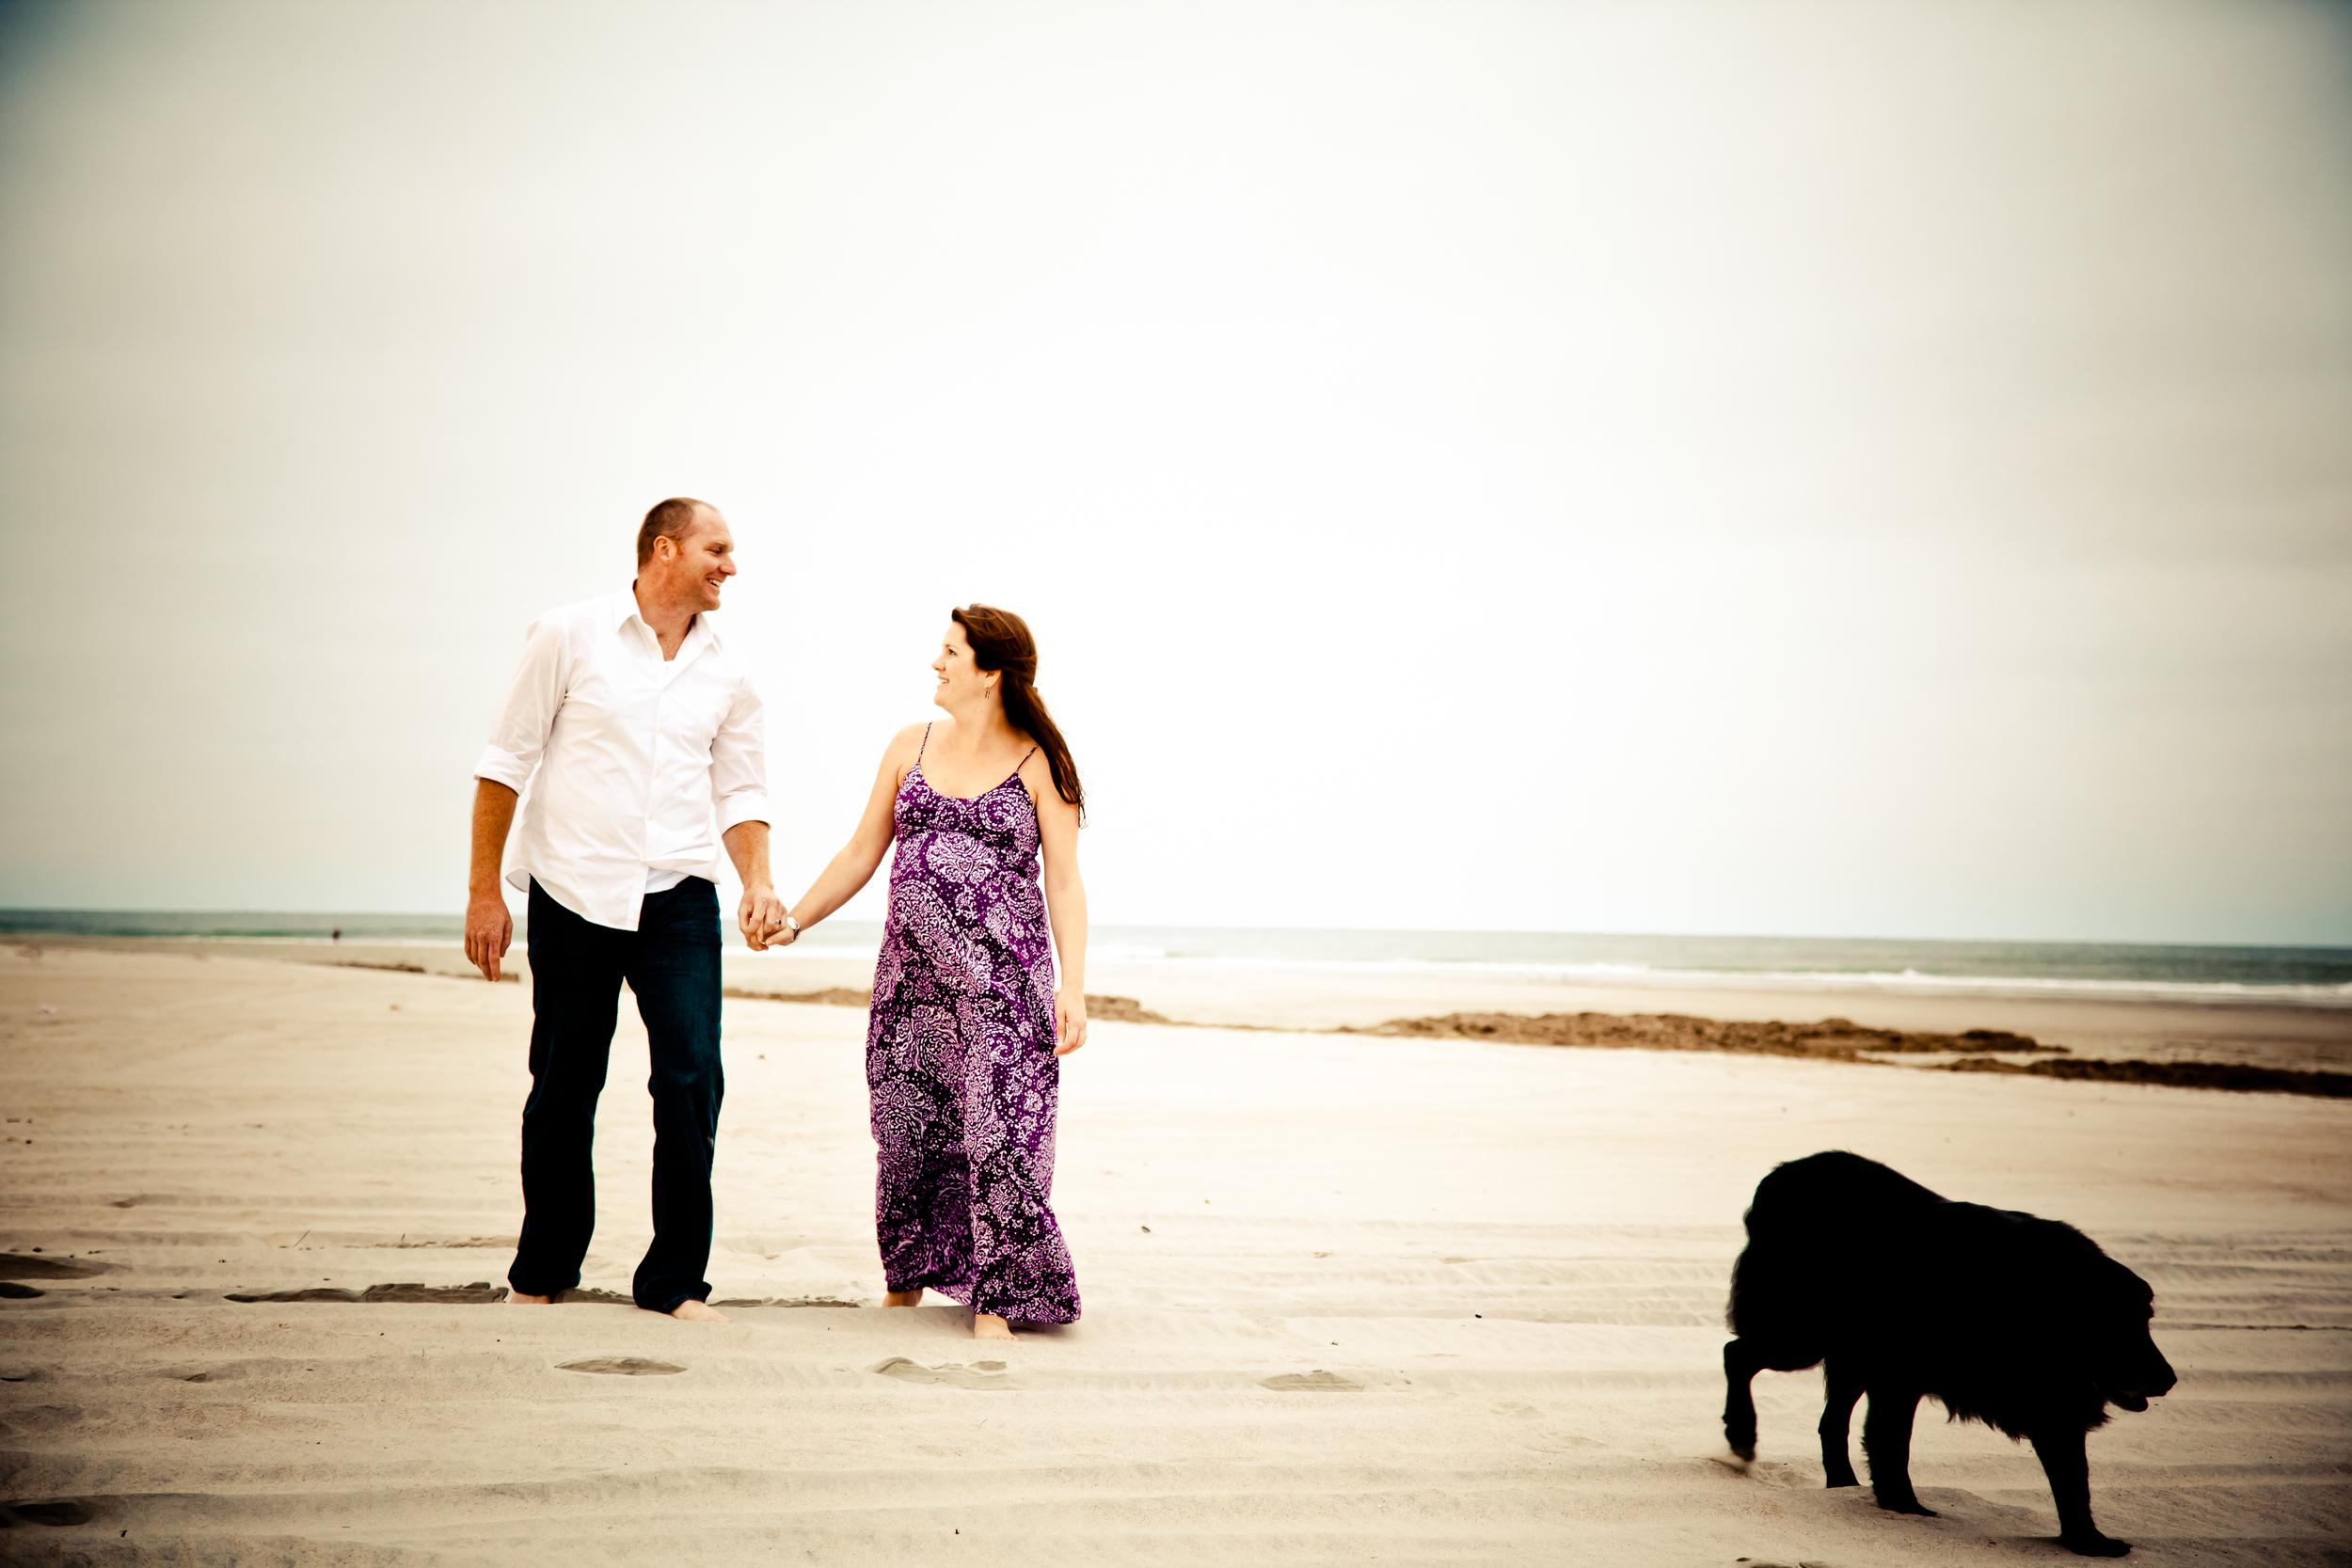 Richard Barlow Photography - Maternity Photography in North Carolina